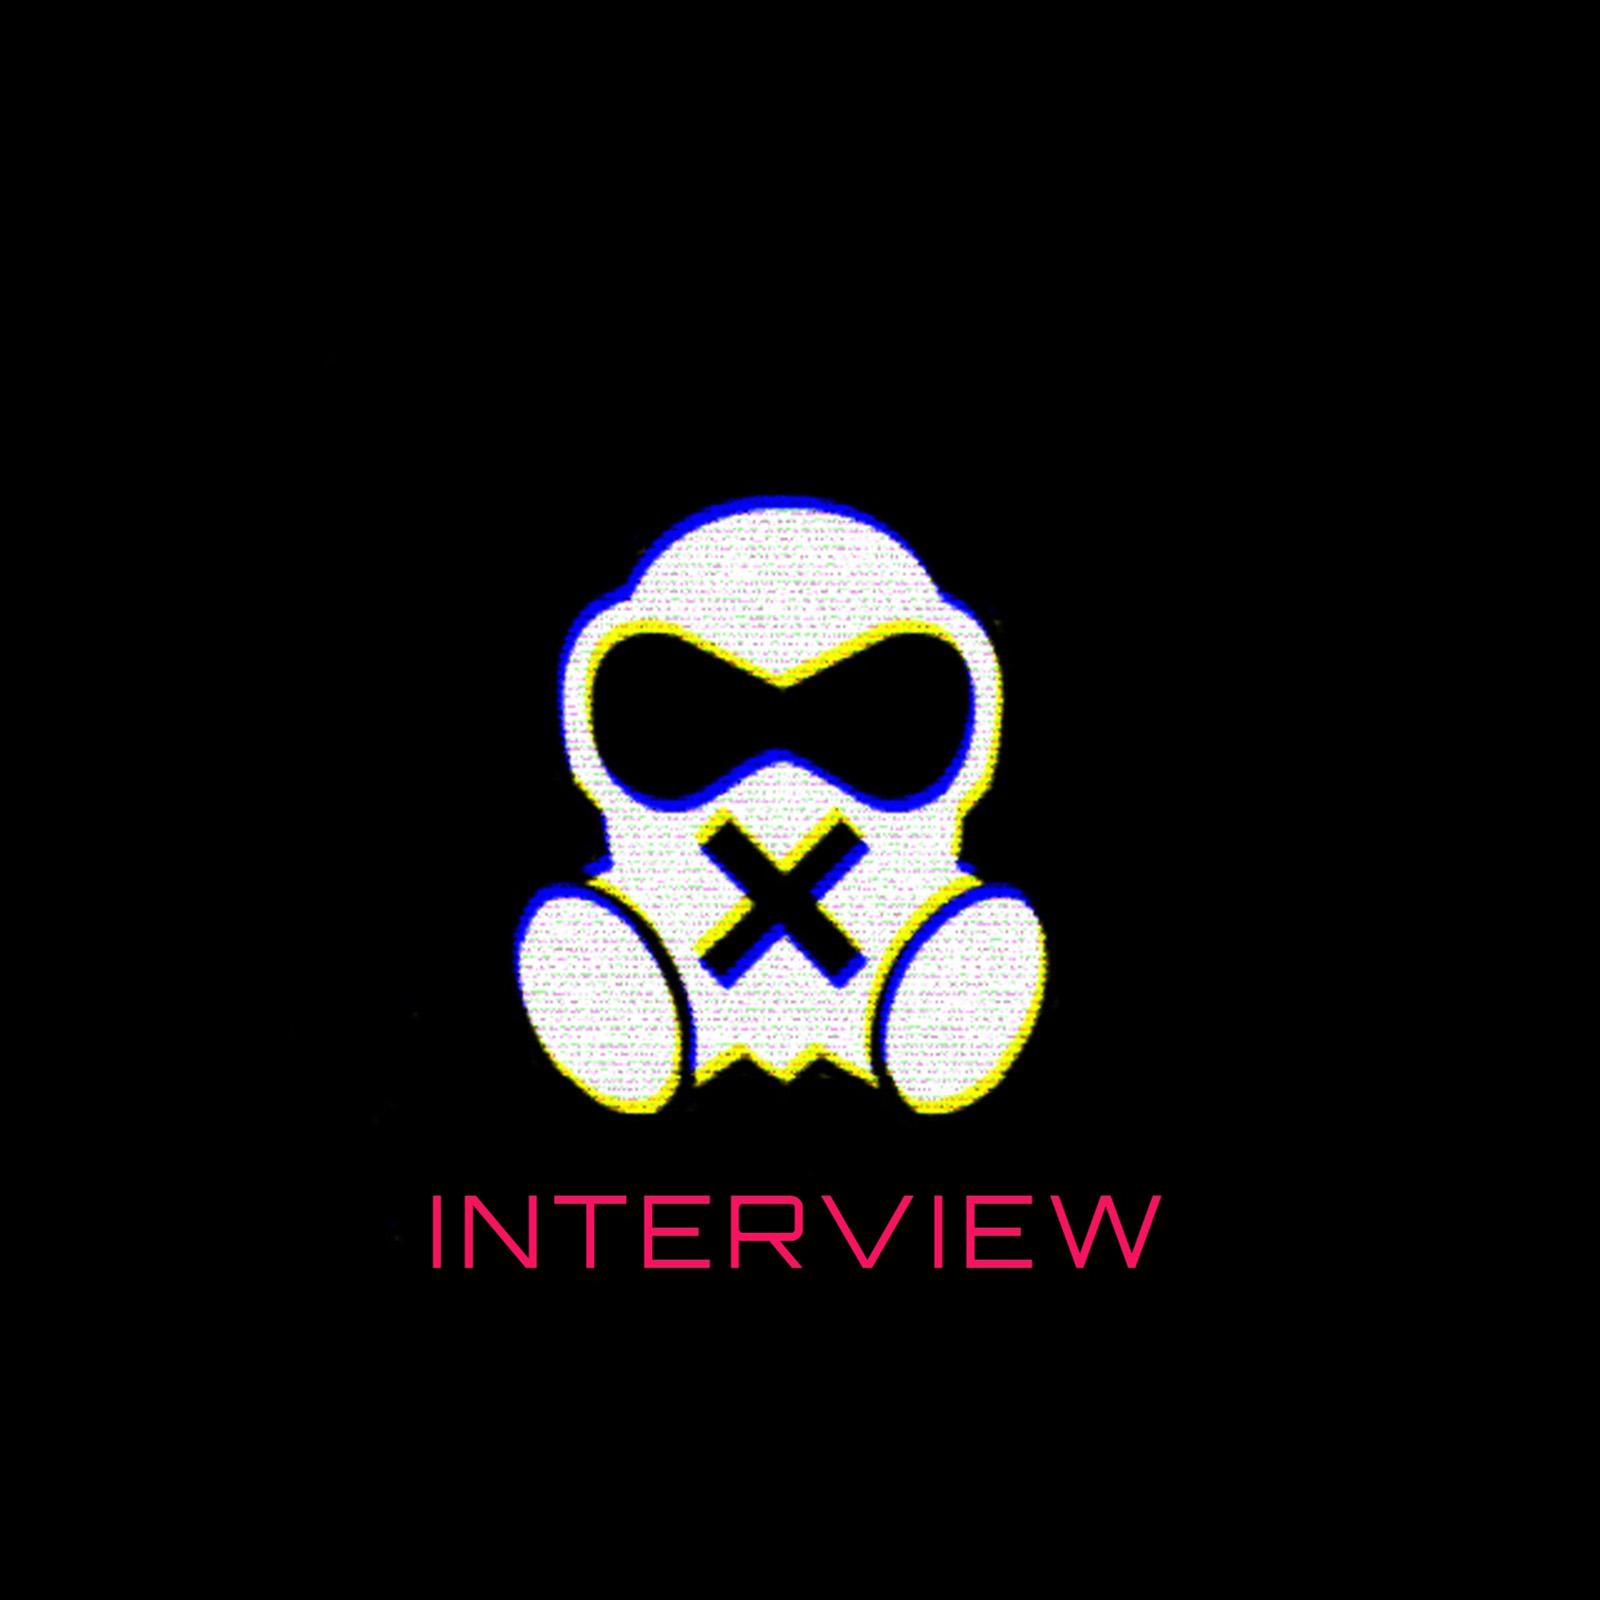 Interview by E.L